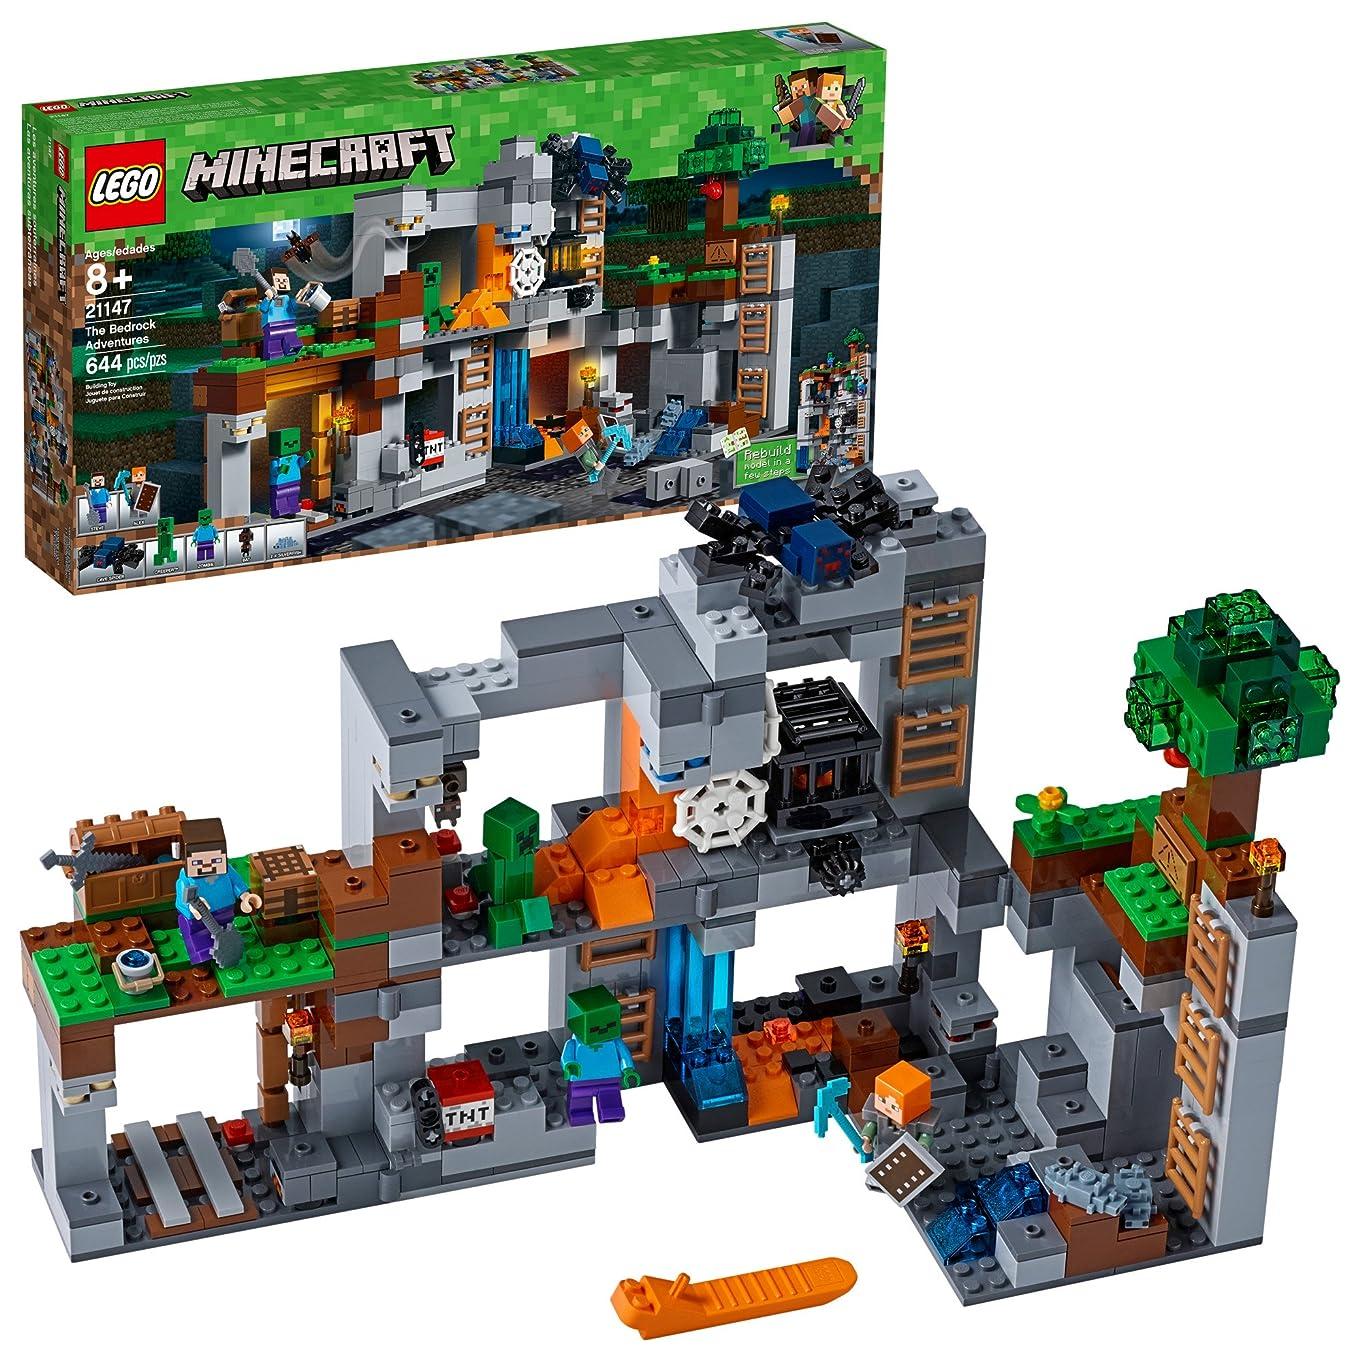 LEGO Minecraft The Bedrock Adventures 21147 Building Kit (644 Piece)